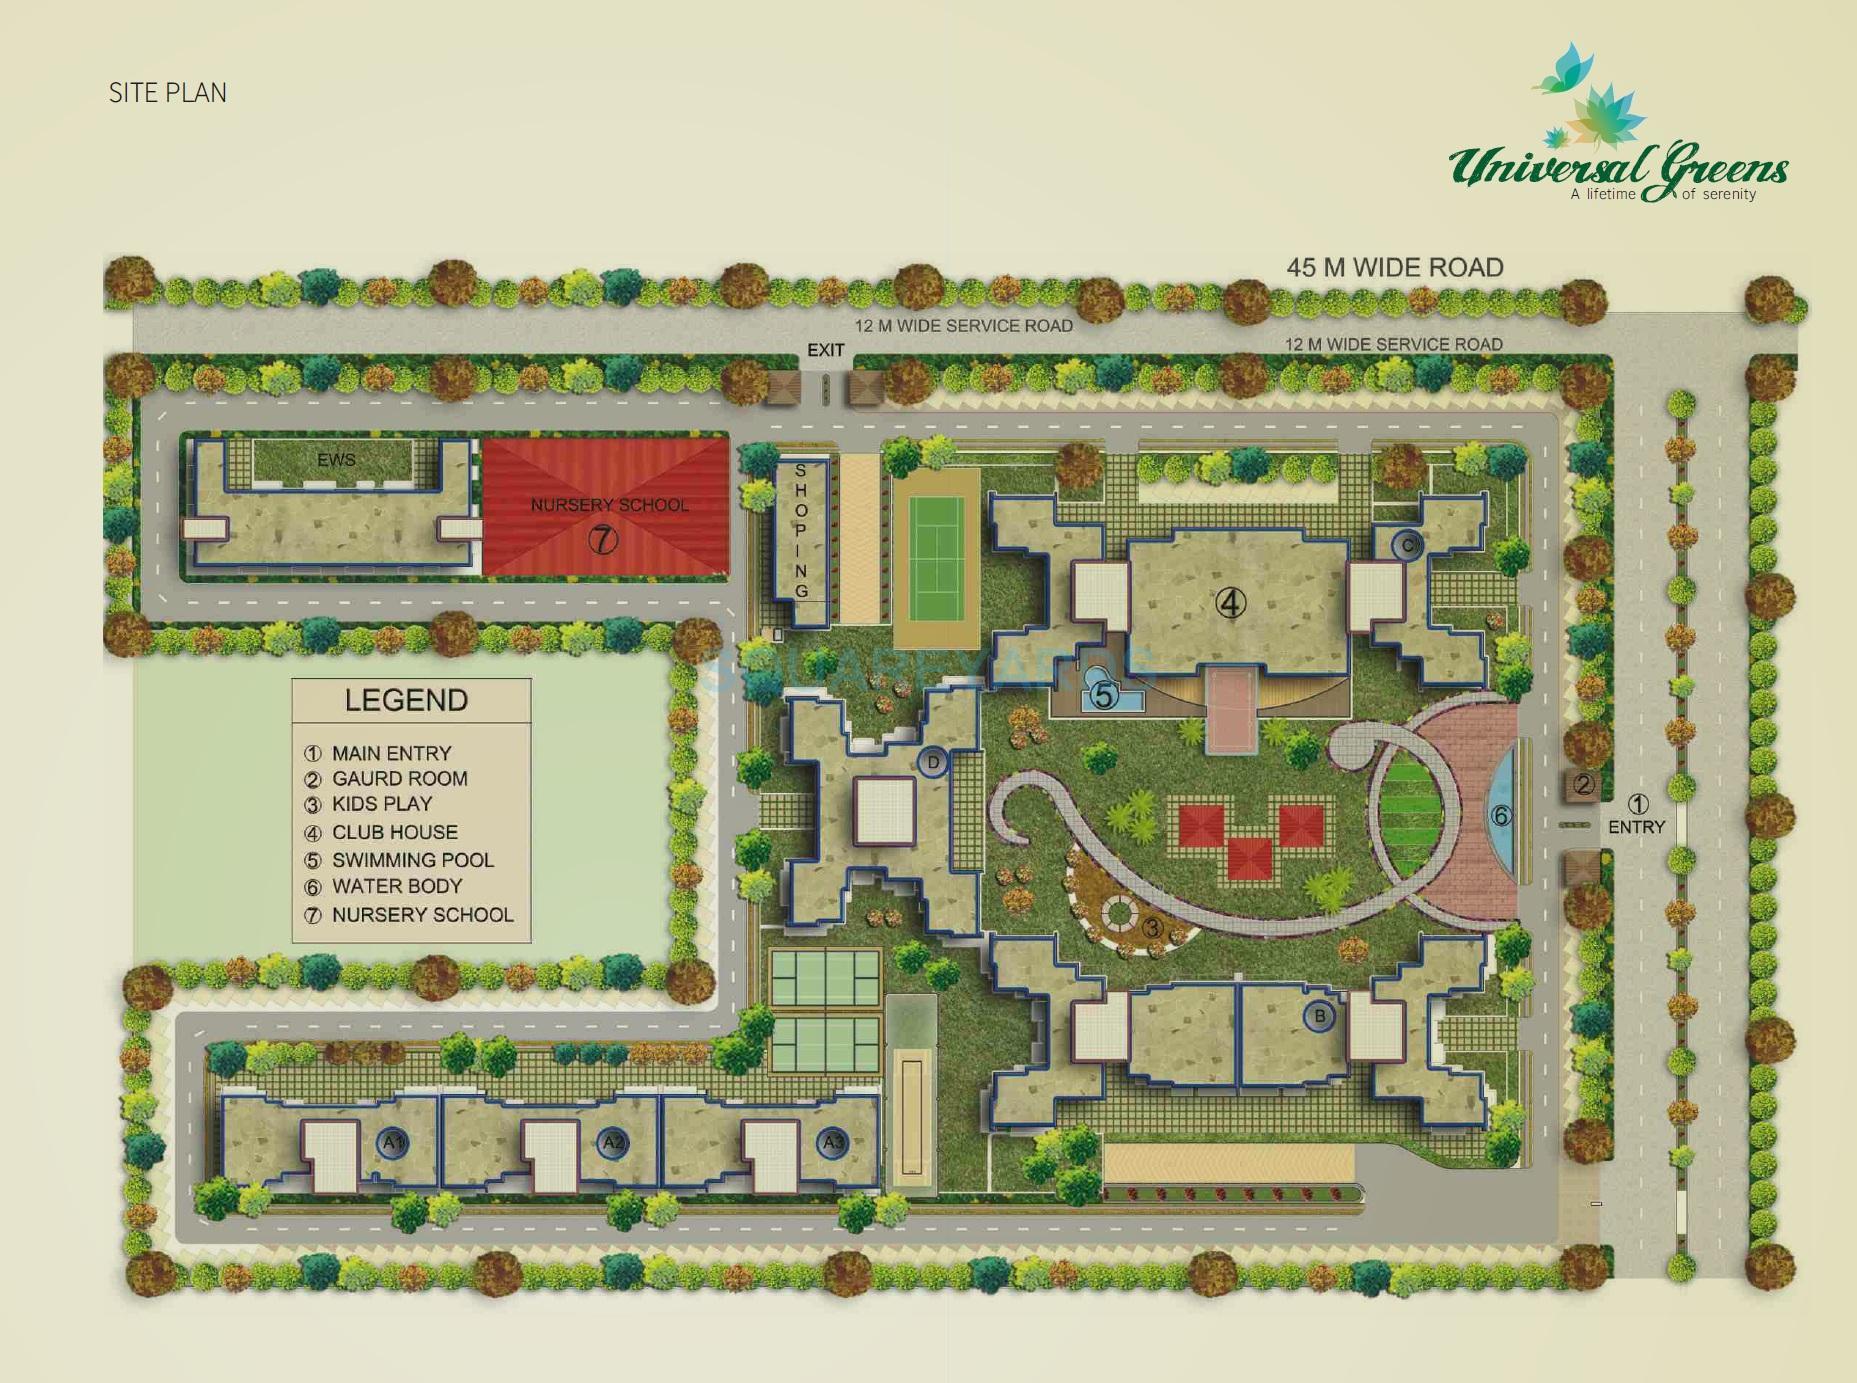 master-plan-image-Picture-universal-greens-2129383